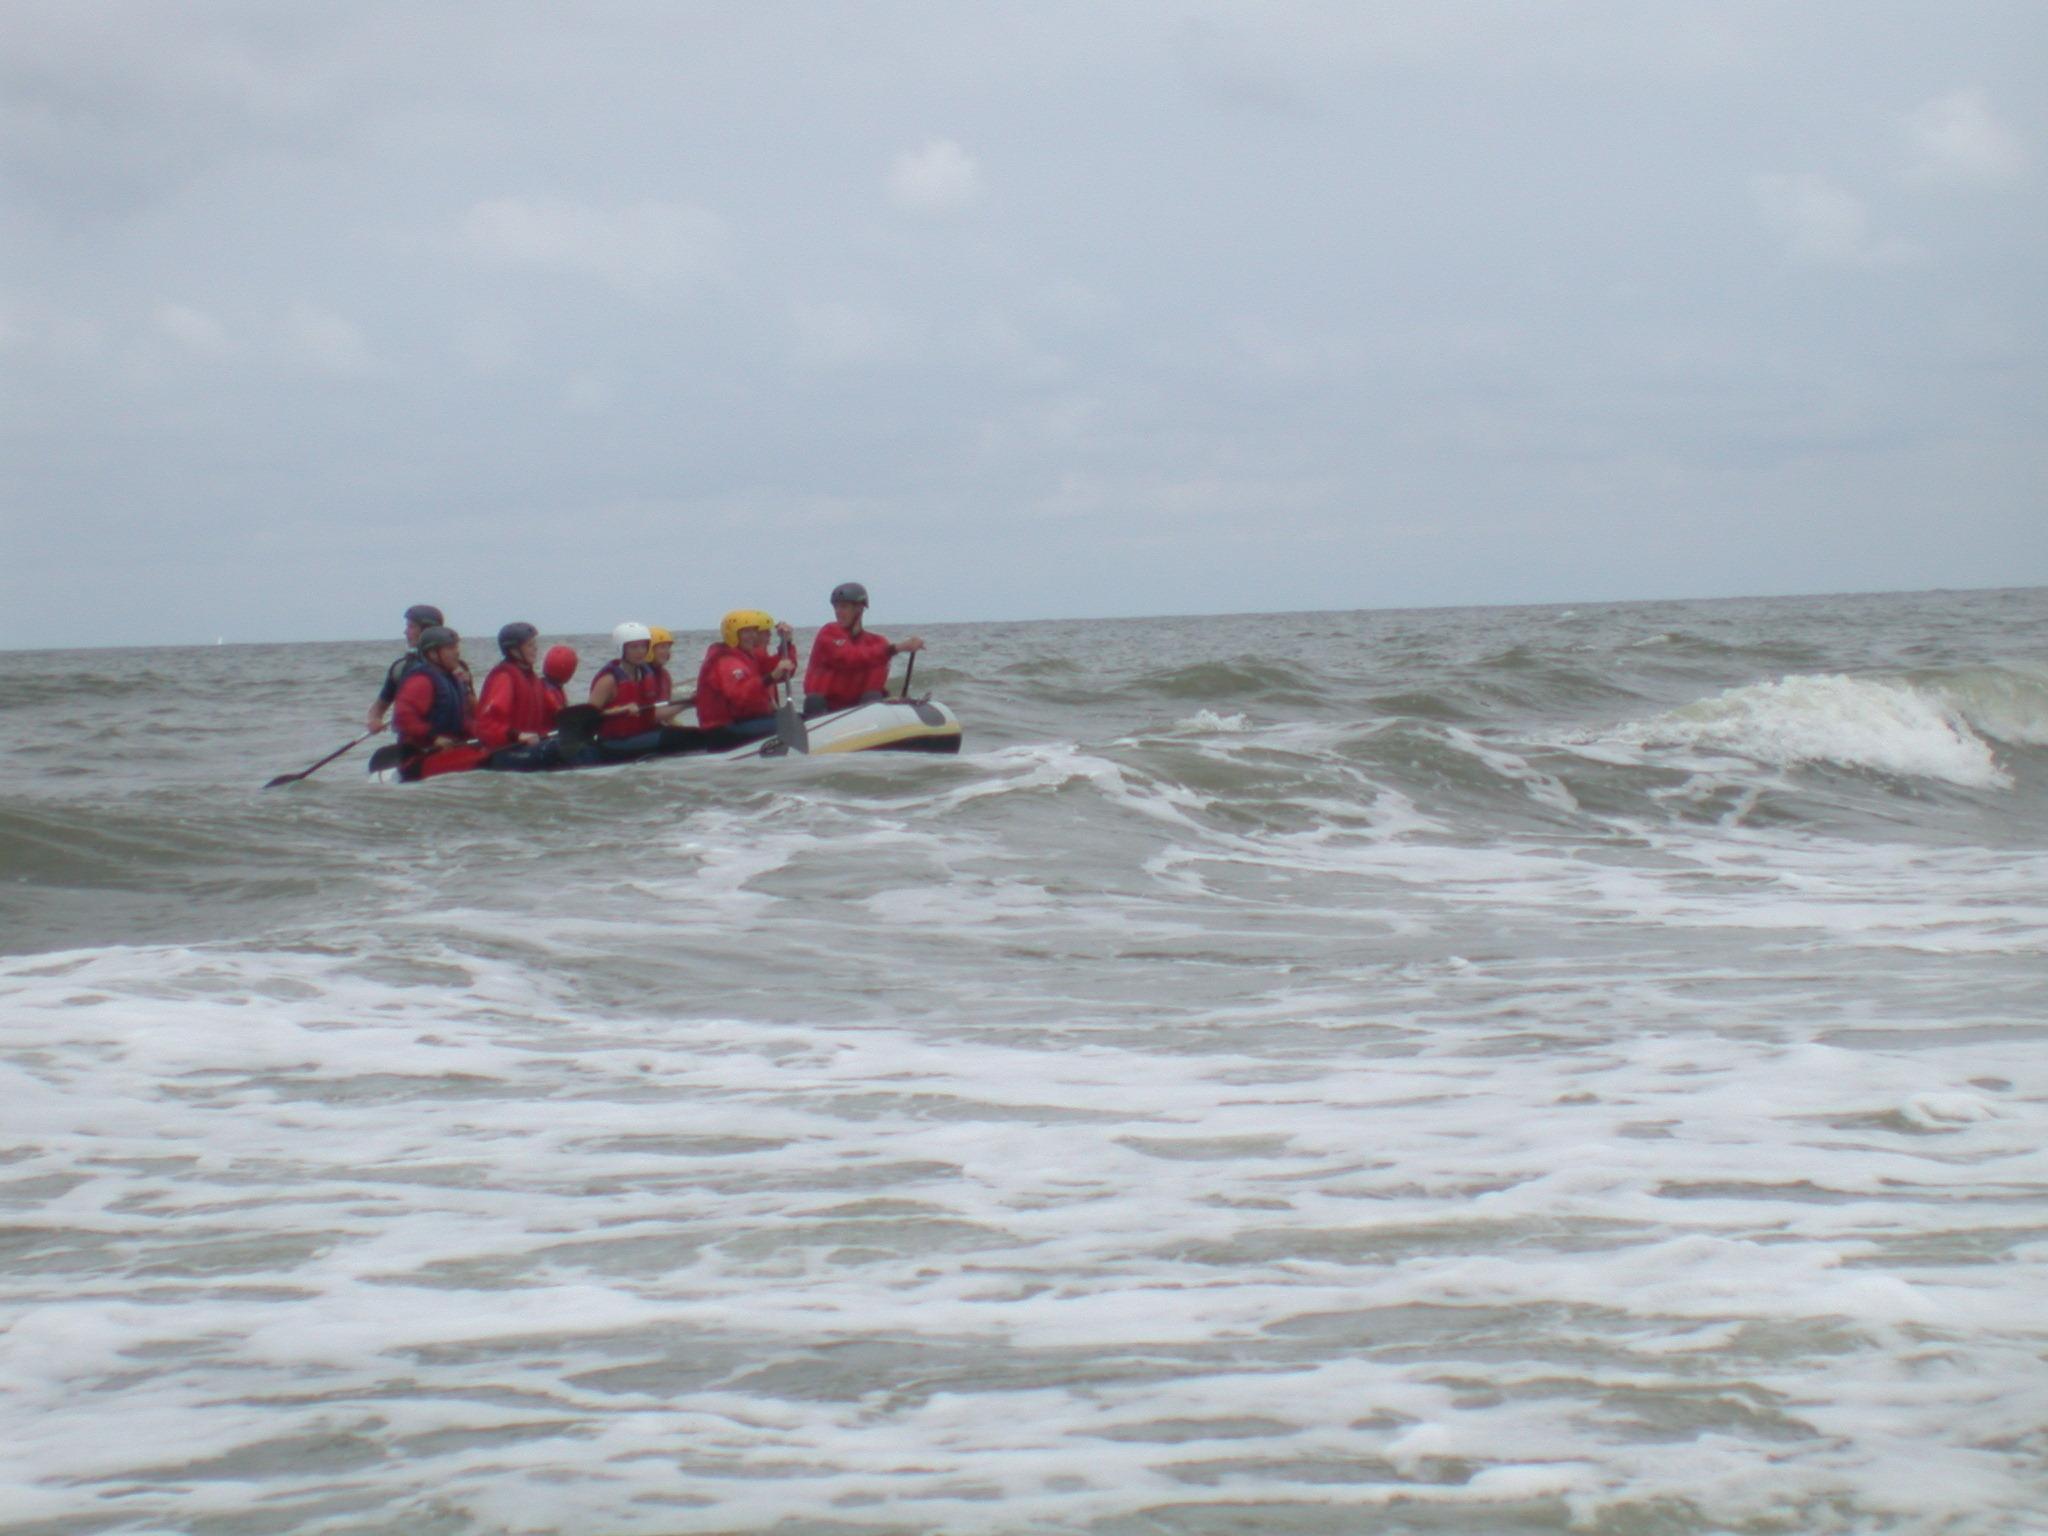 nature characters humanoids watersport watersports sport sports summer raft rafting sea group